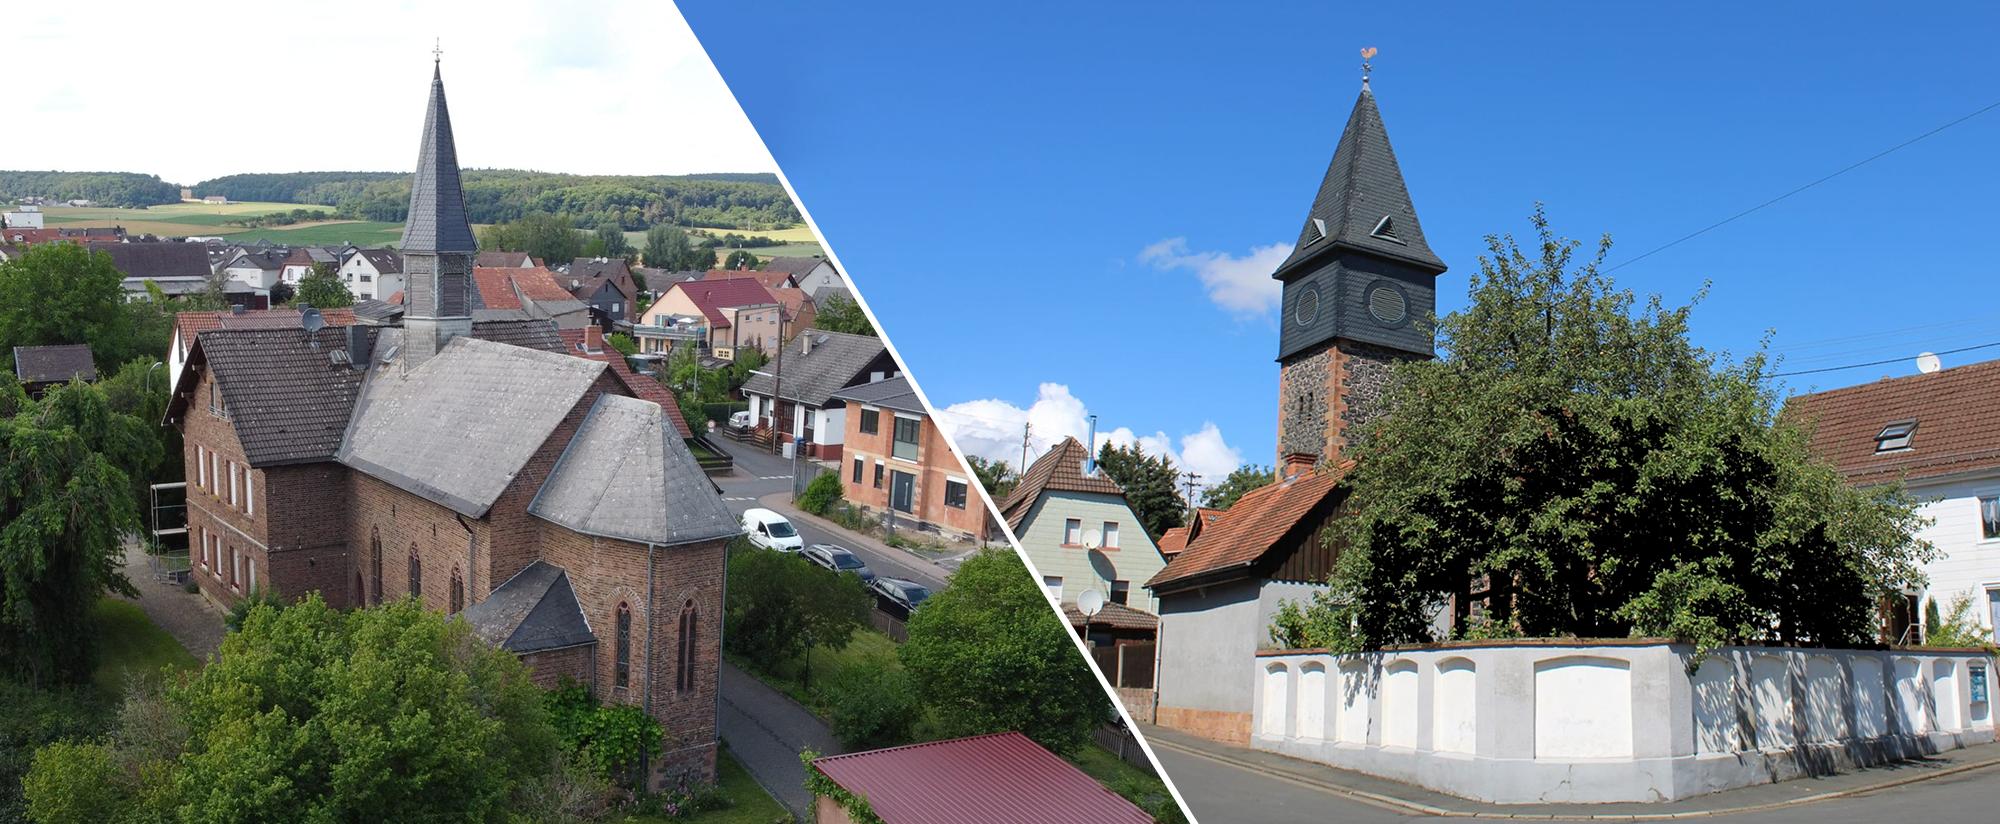 St. Martins Gemeinde Höchst a.d. Nidder | St. Simon-Judae Gemeinde Usenborn